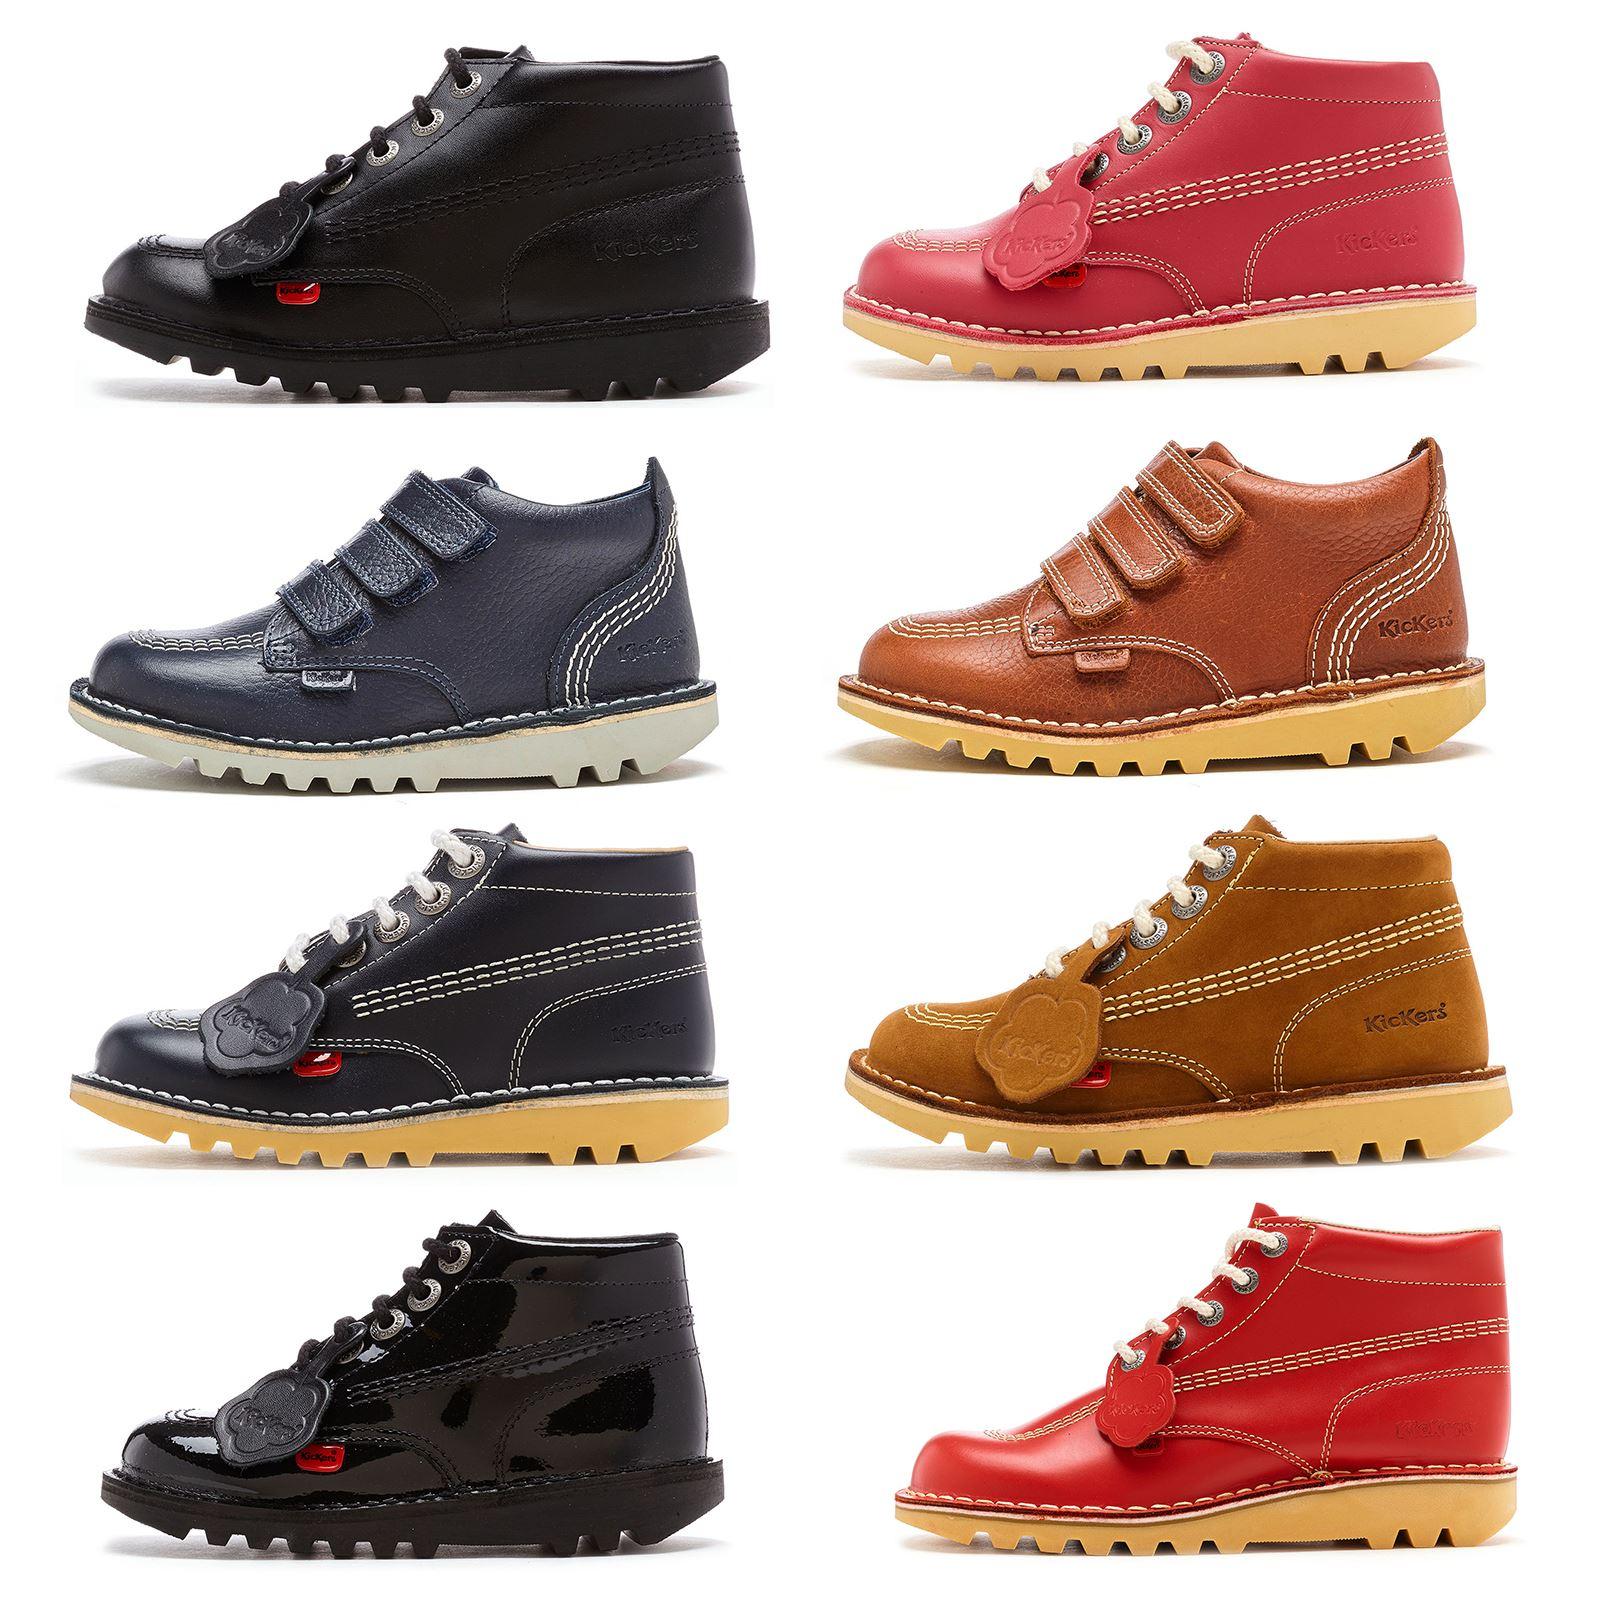 Kickers Toddlers Kick Hi Core Black Leather Boots Shoes UK 11 EU 29 Brand New